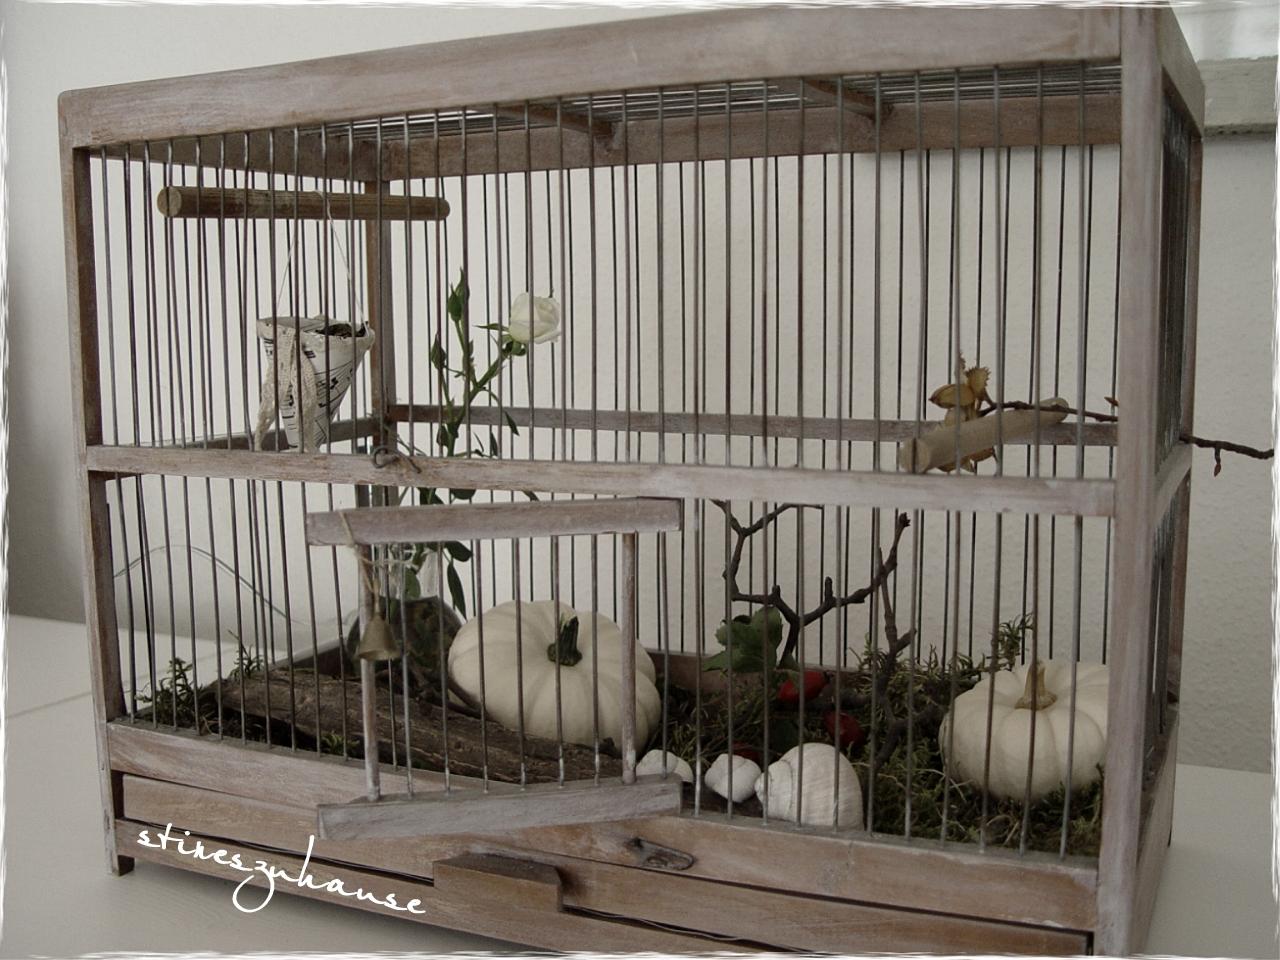 stineszuhause letztmalig. Black Bedroom Furniture Sets. Home Design Ideas